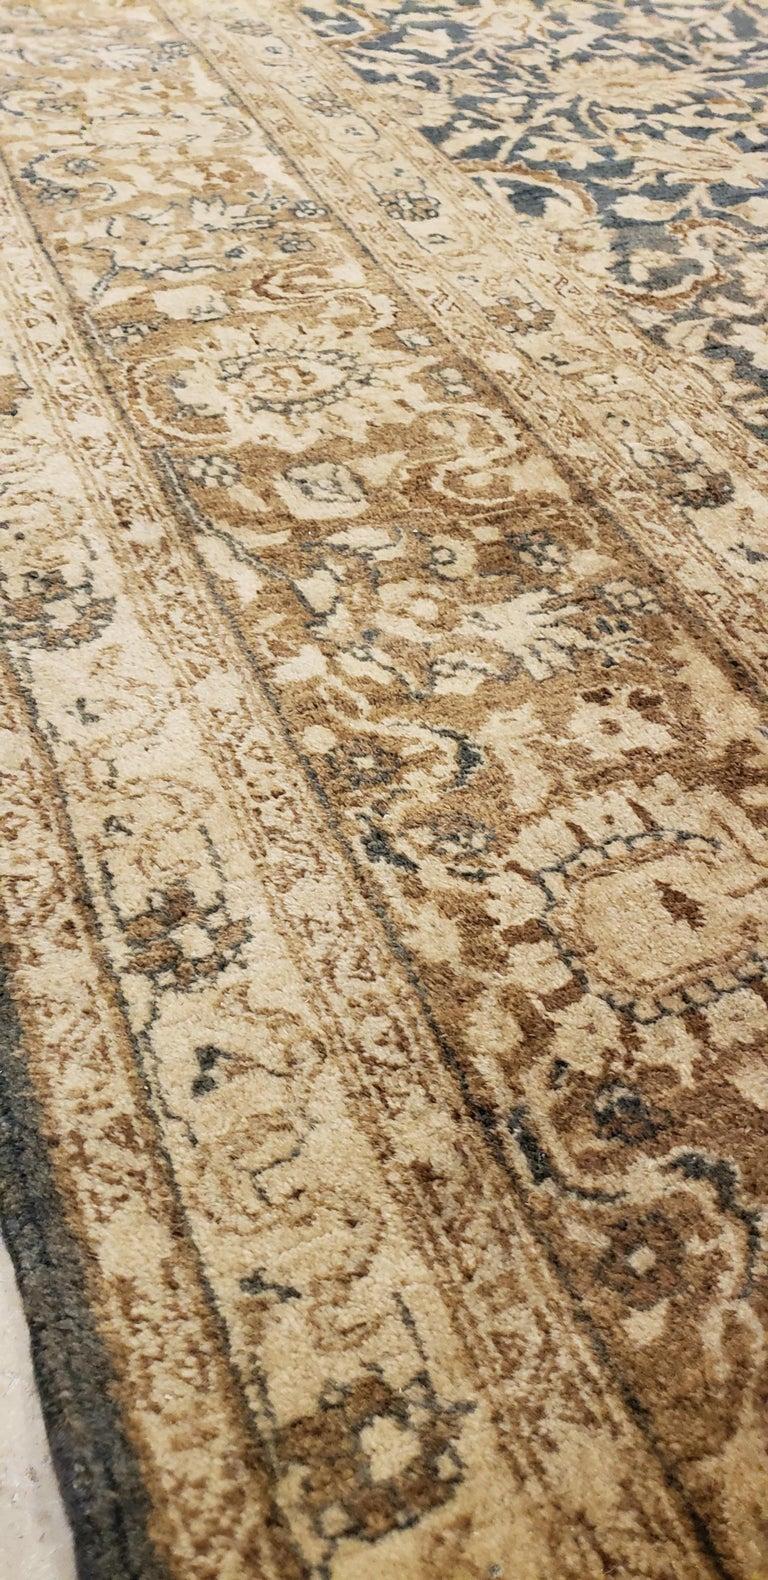 Antique Persian Tabriz Carpet, Handmade Oriental Rug, Beige, Gray/Blue, Taupe For Sale 3